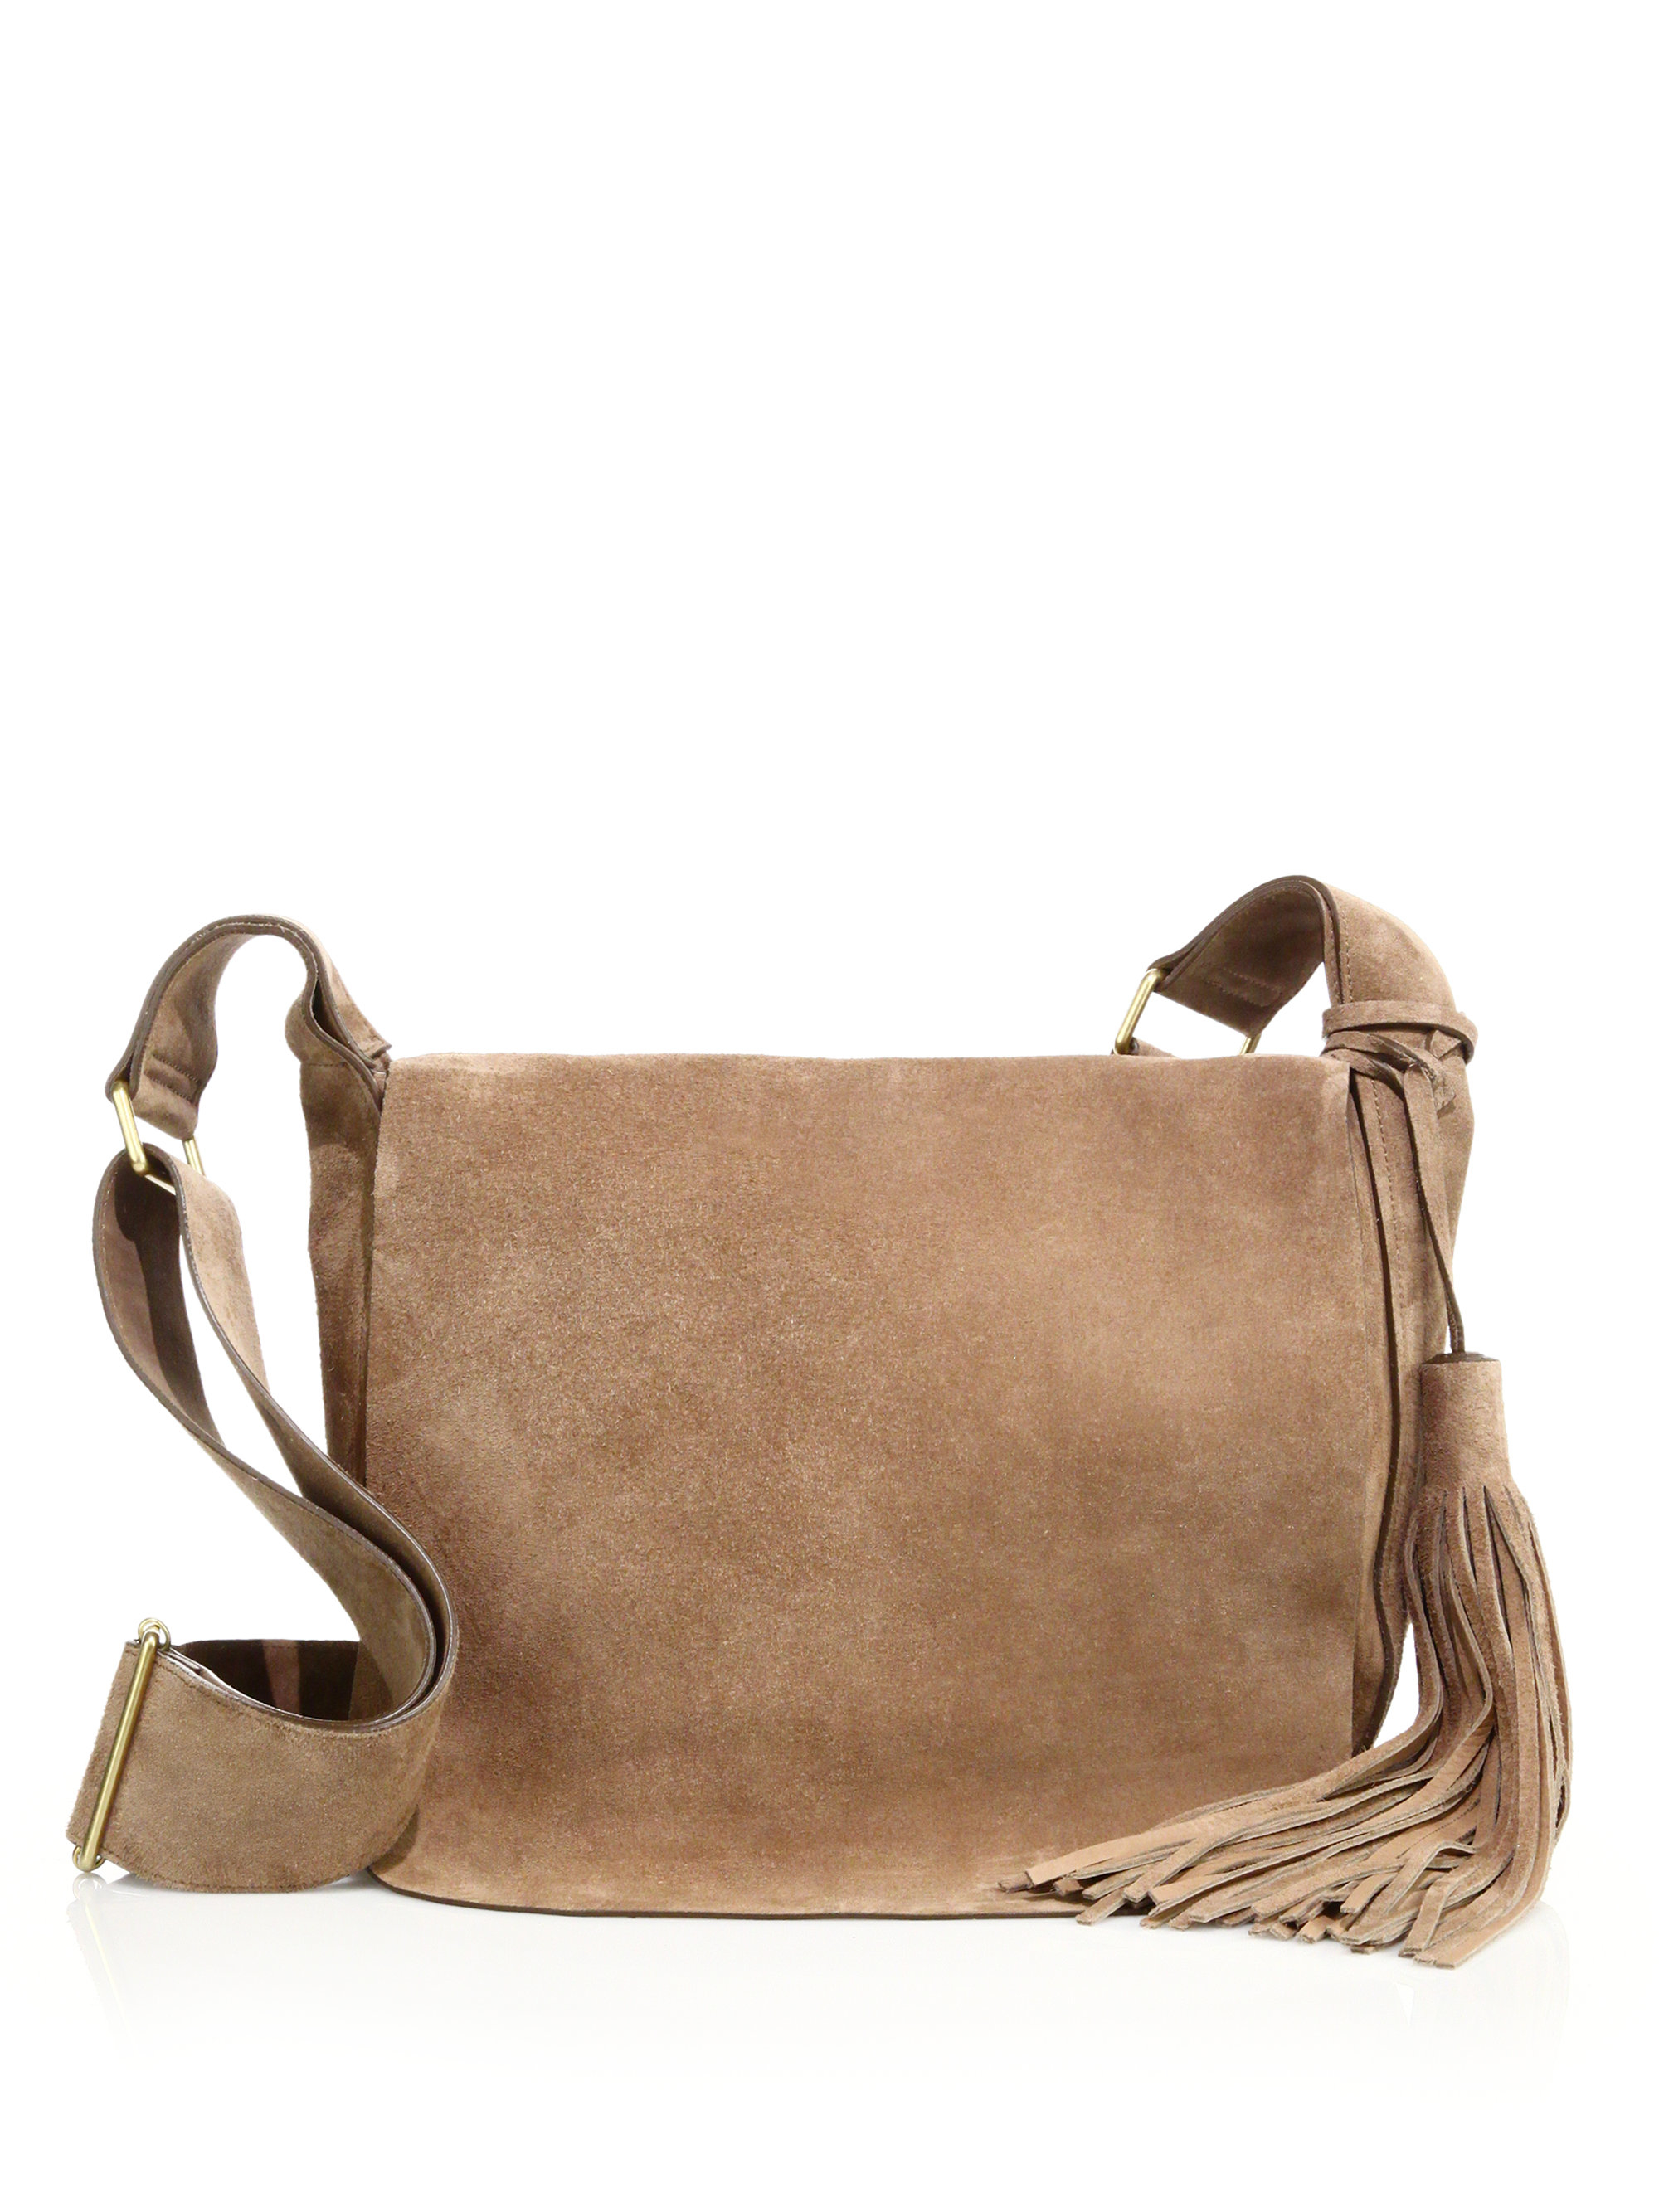 60da707bb105 Lyst - A.L.C. Jackson Suede Crossbody Bag in Natural